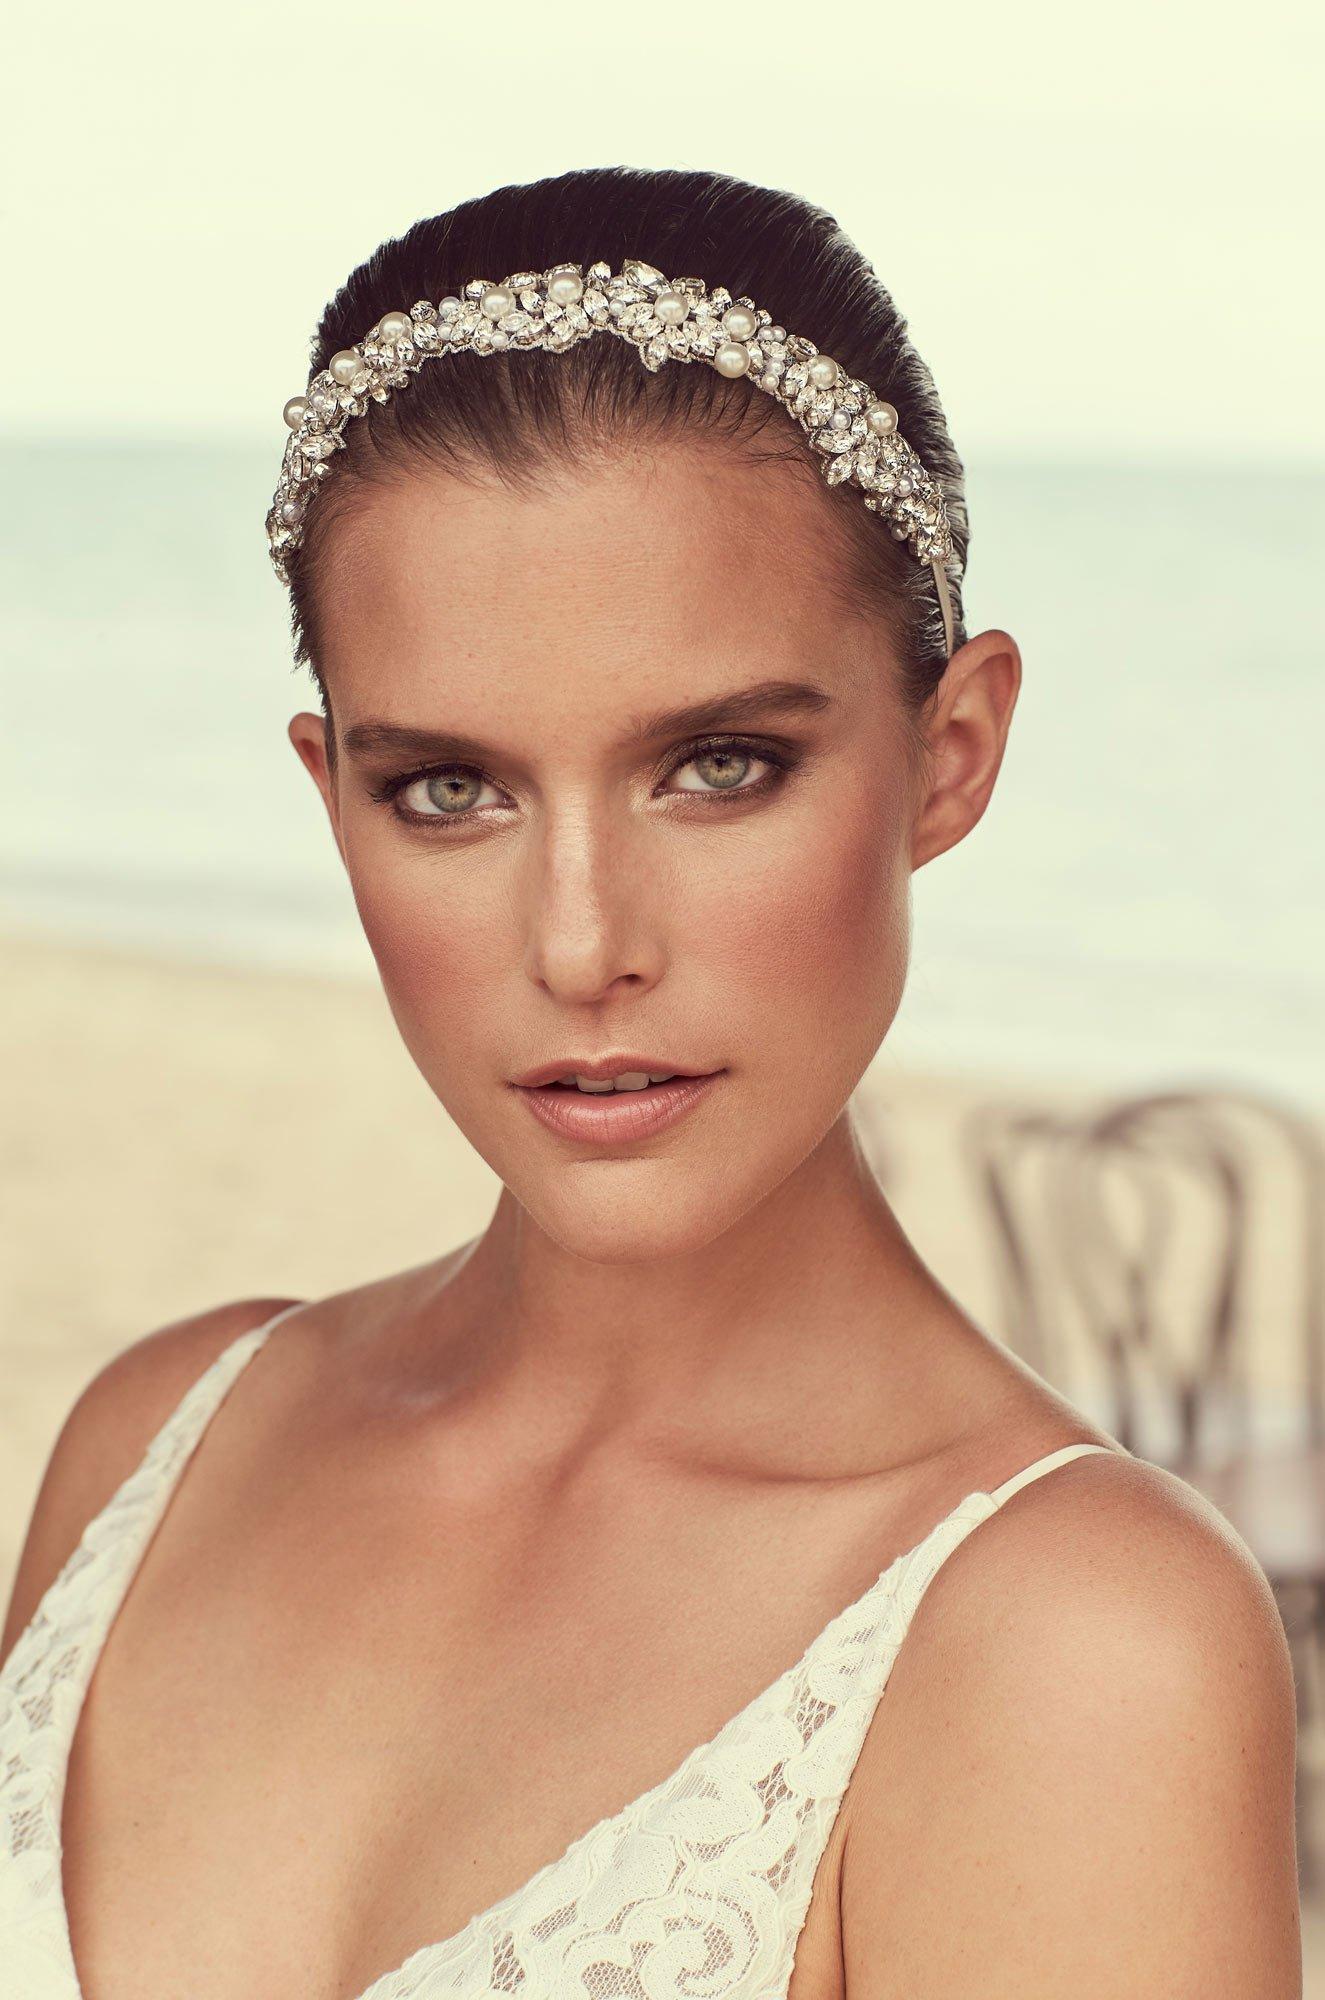 Rhinestone Pearl Bead Hairband – Style #MHB101 | Mikaella Bridal